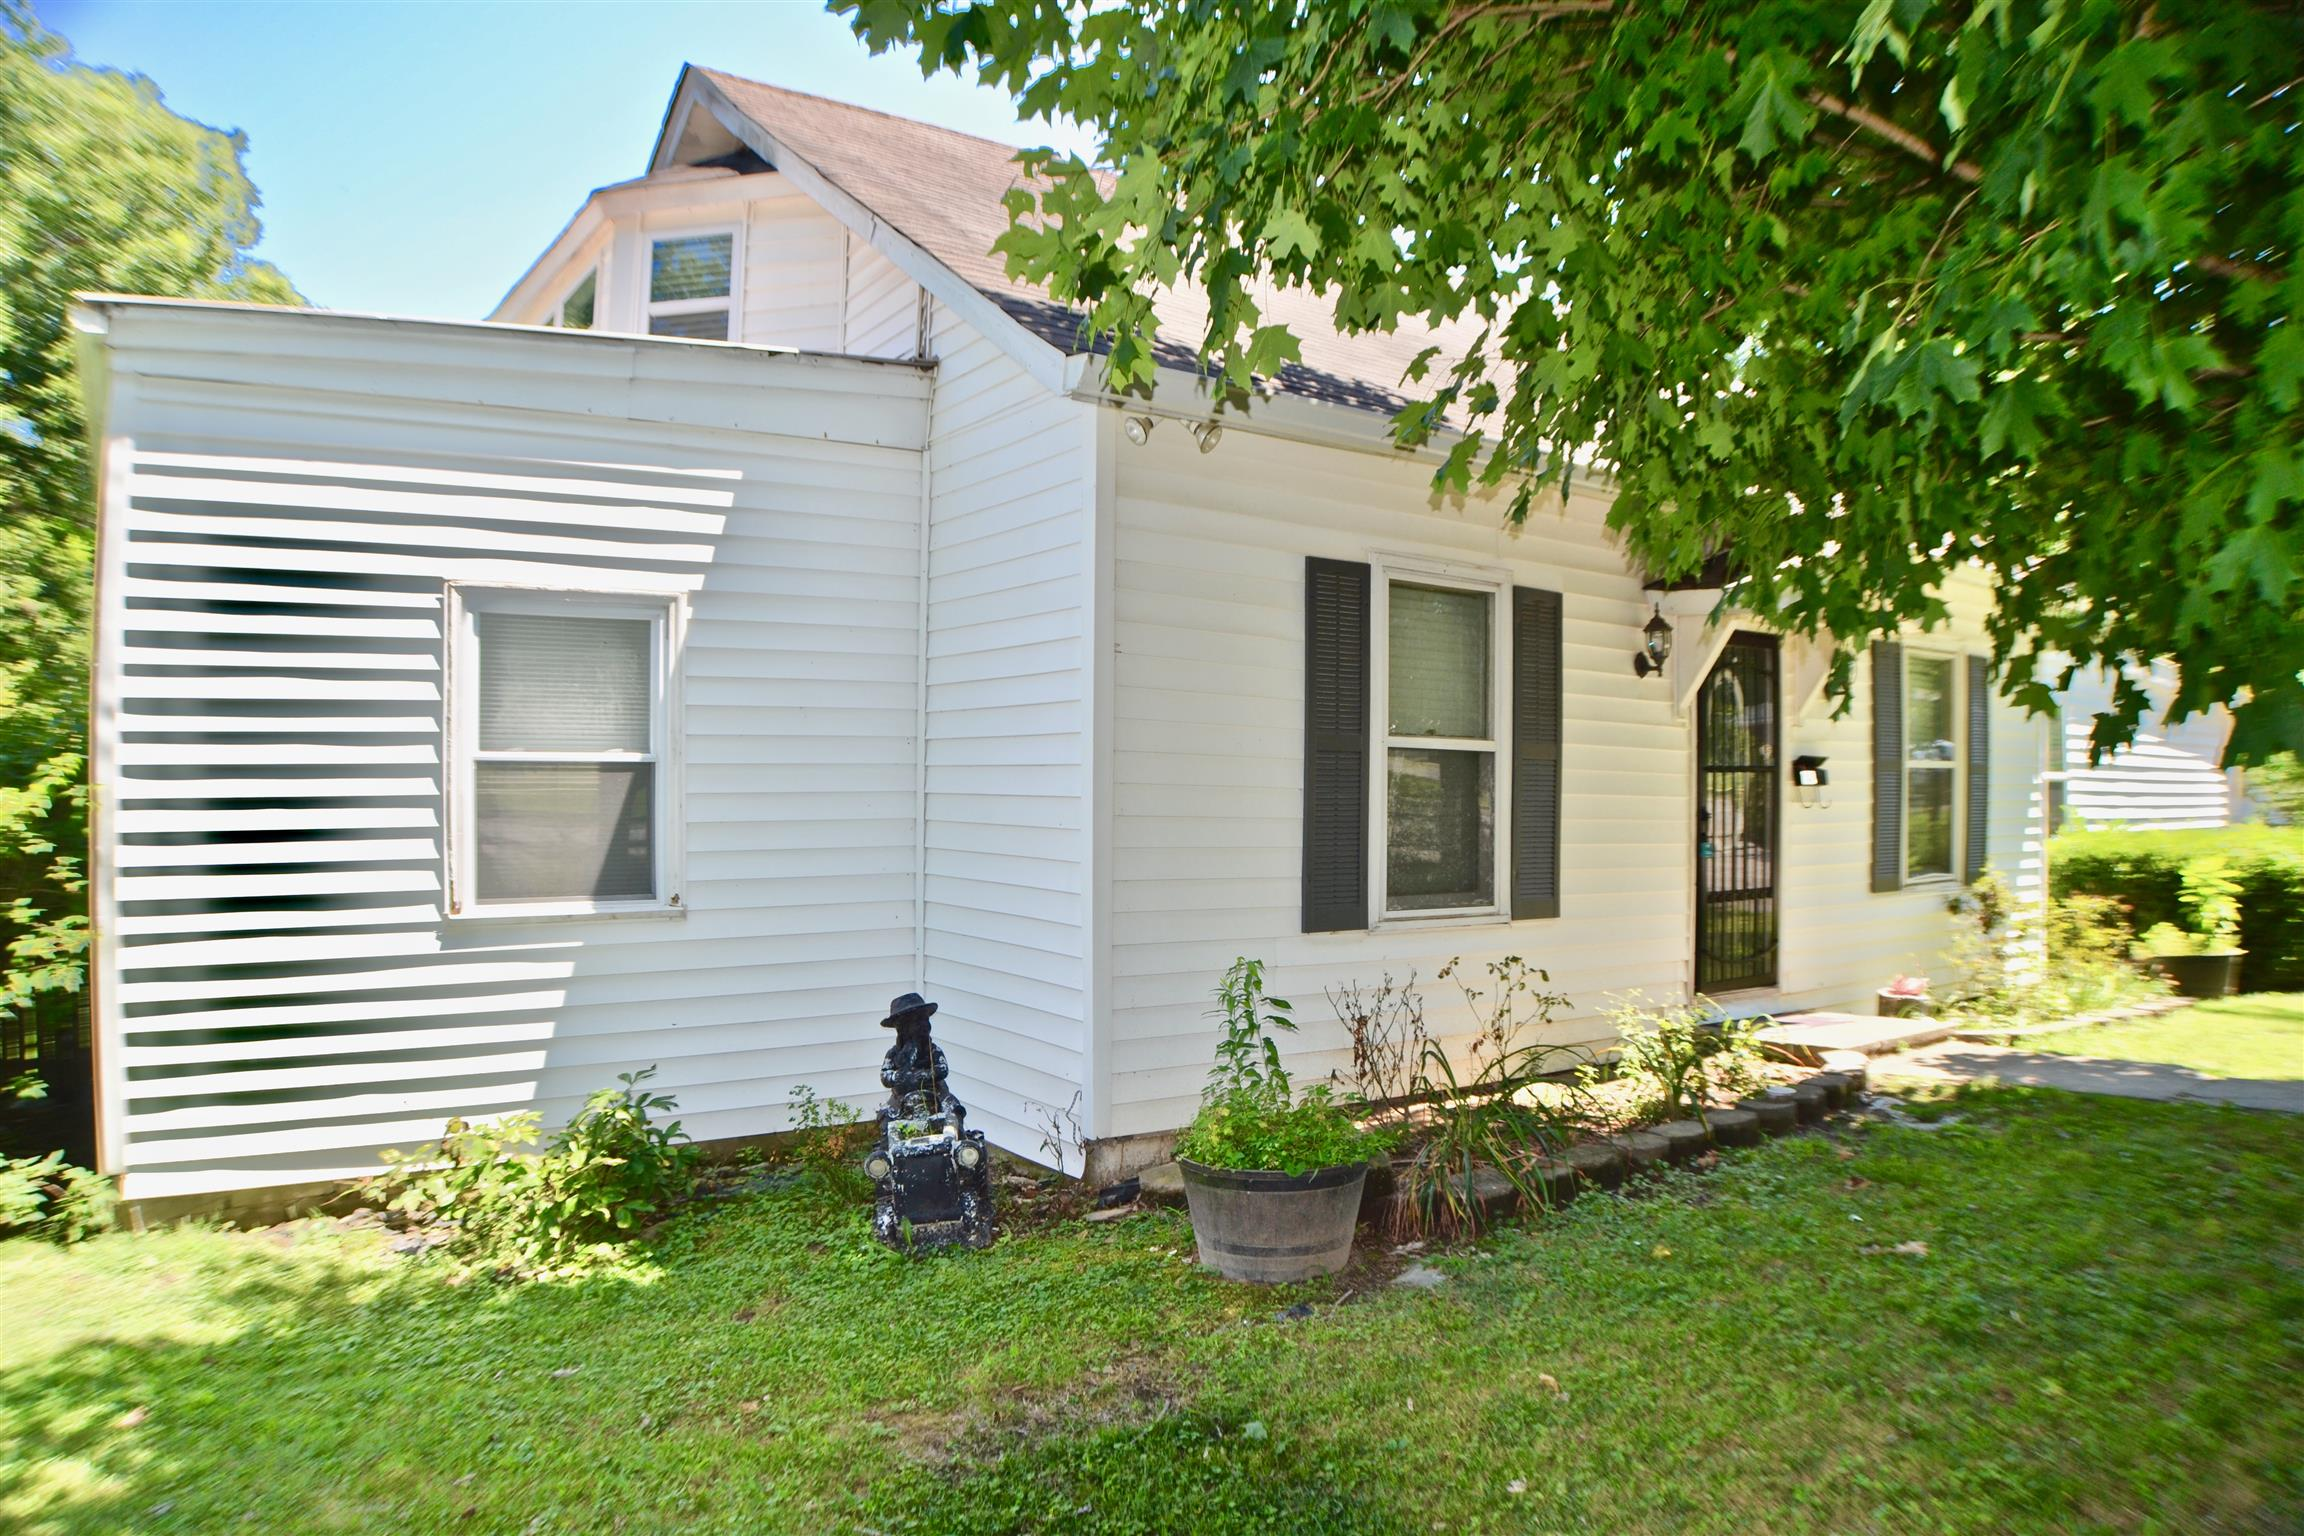 612 S College St, Smithville, TN 37166 - Smithville, TN real estate listing